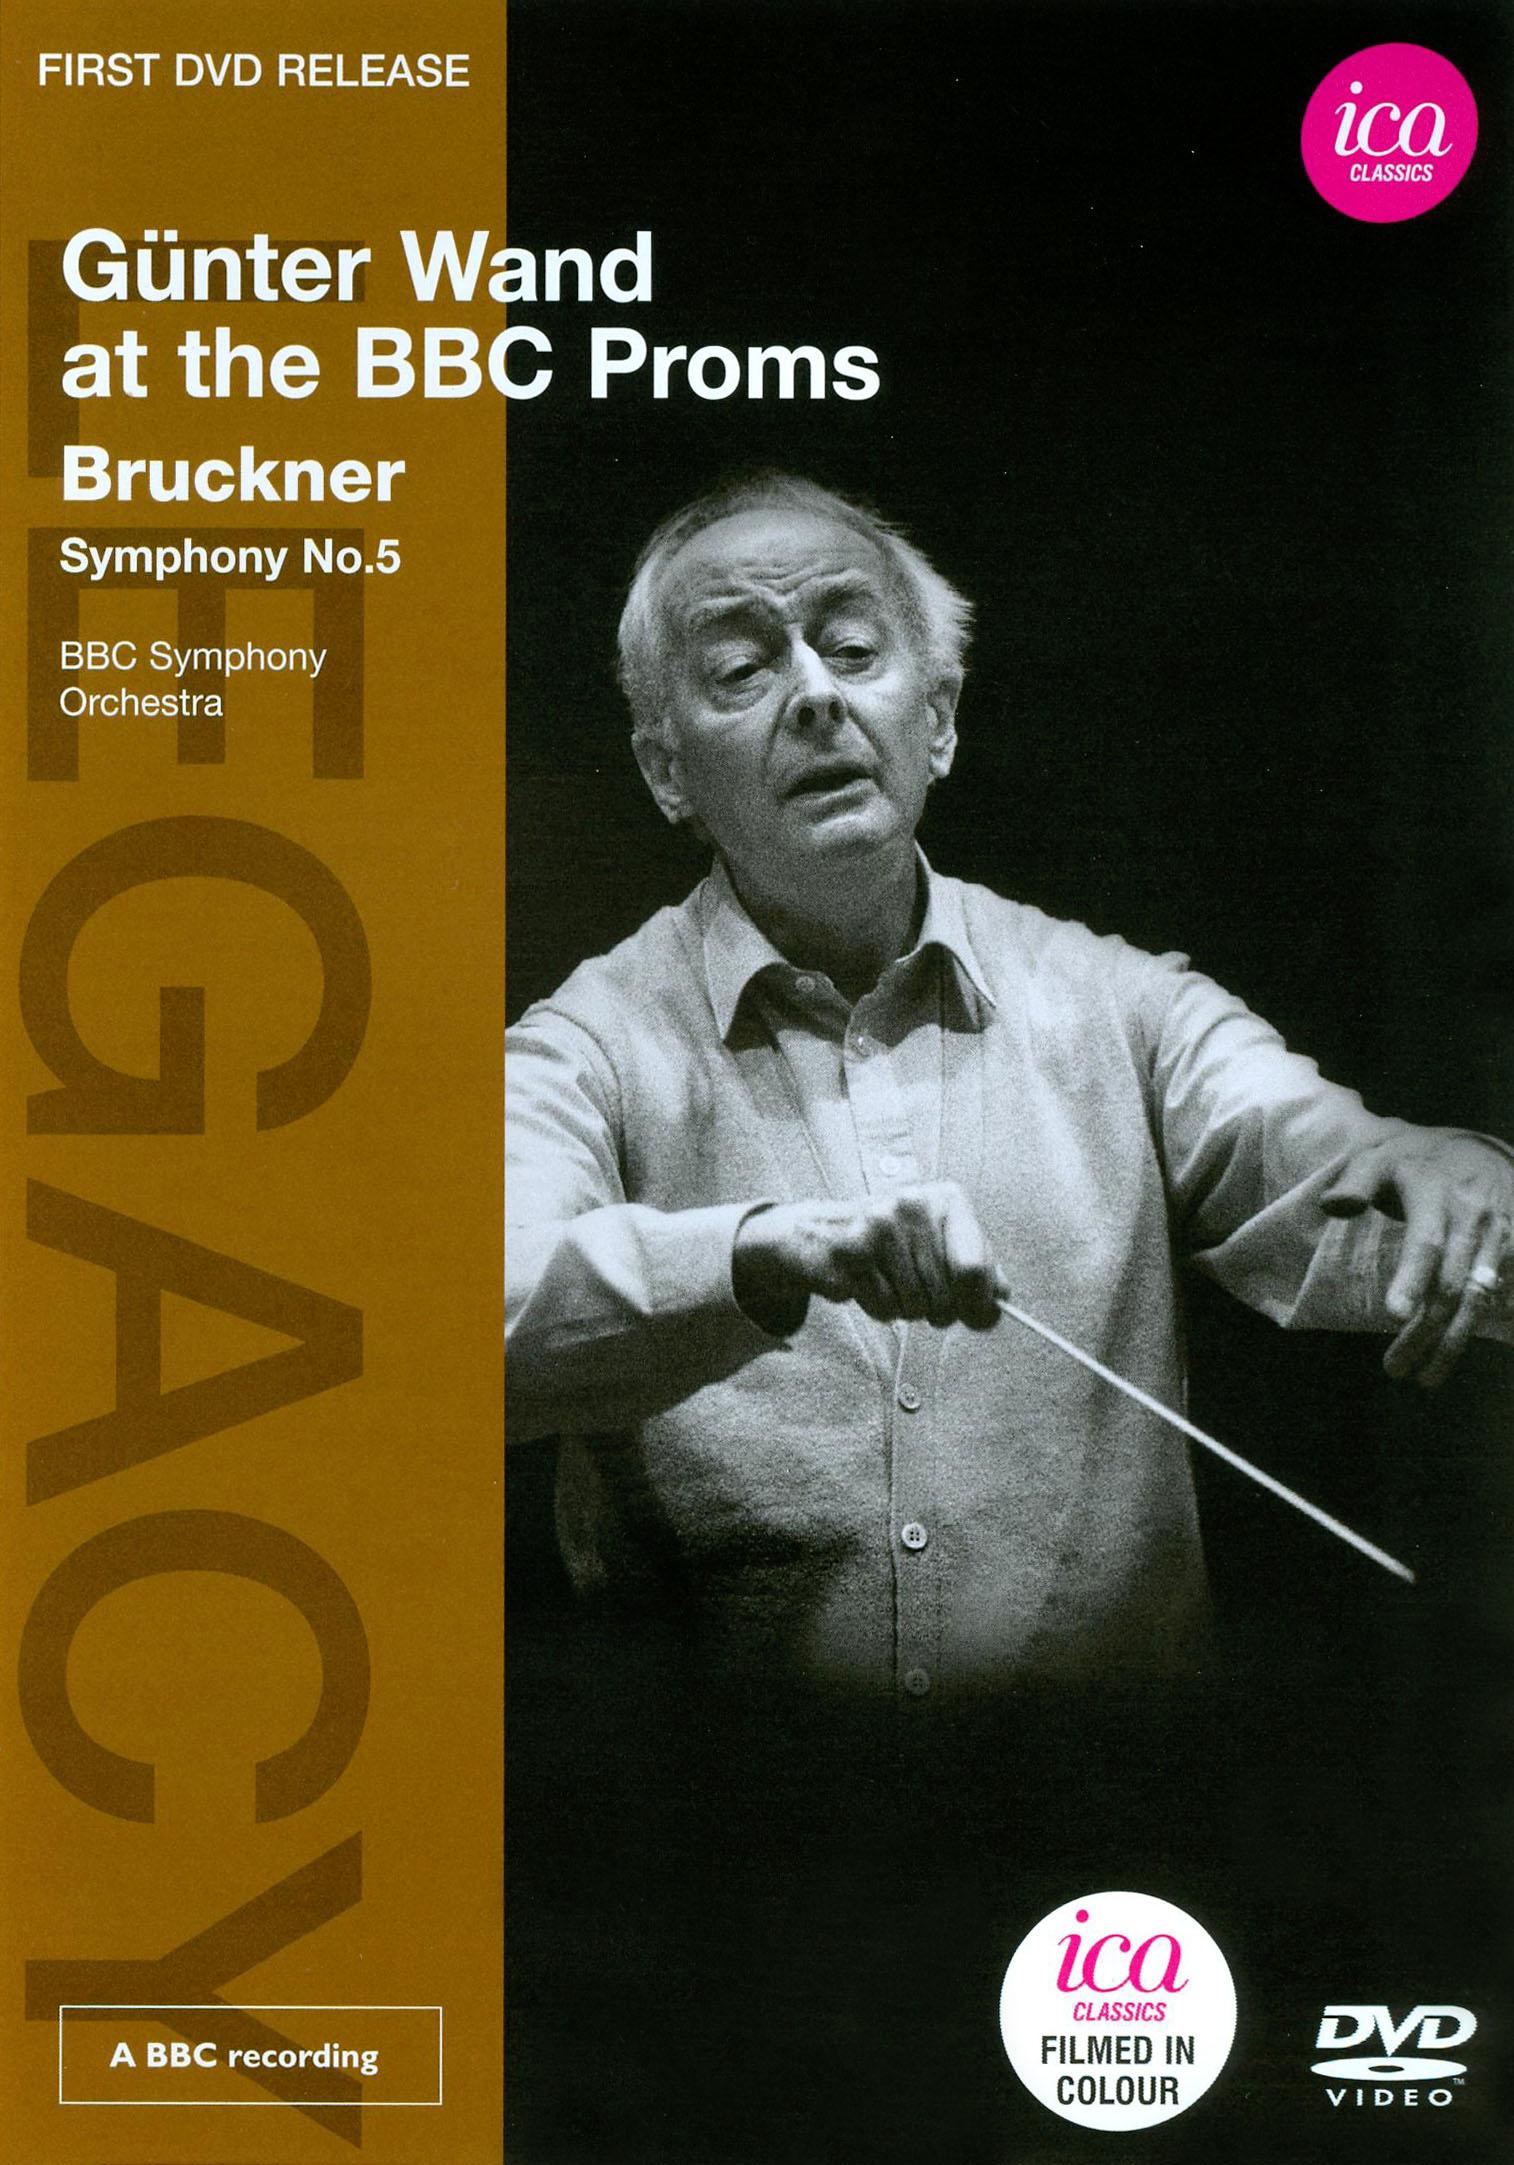 Gunter Wand at the BBC Proms: Bruckner - Symphony No. 5